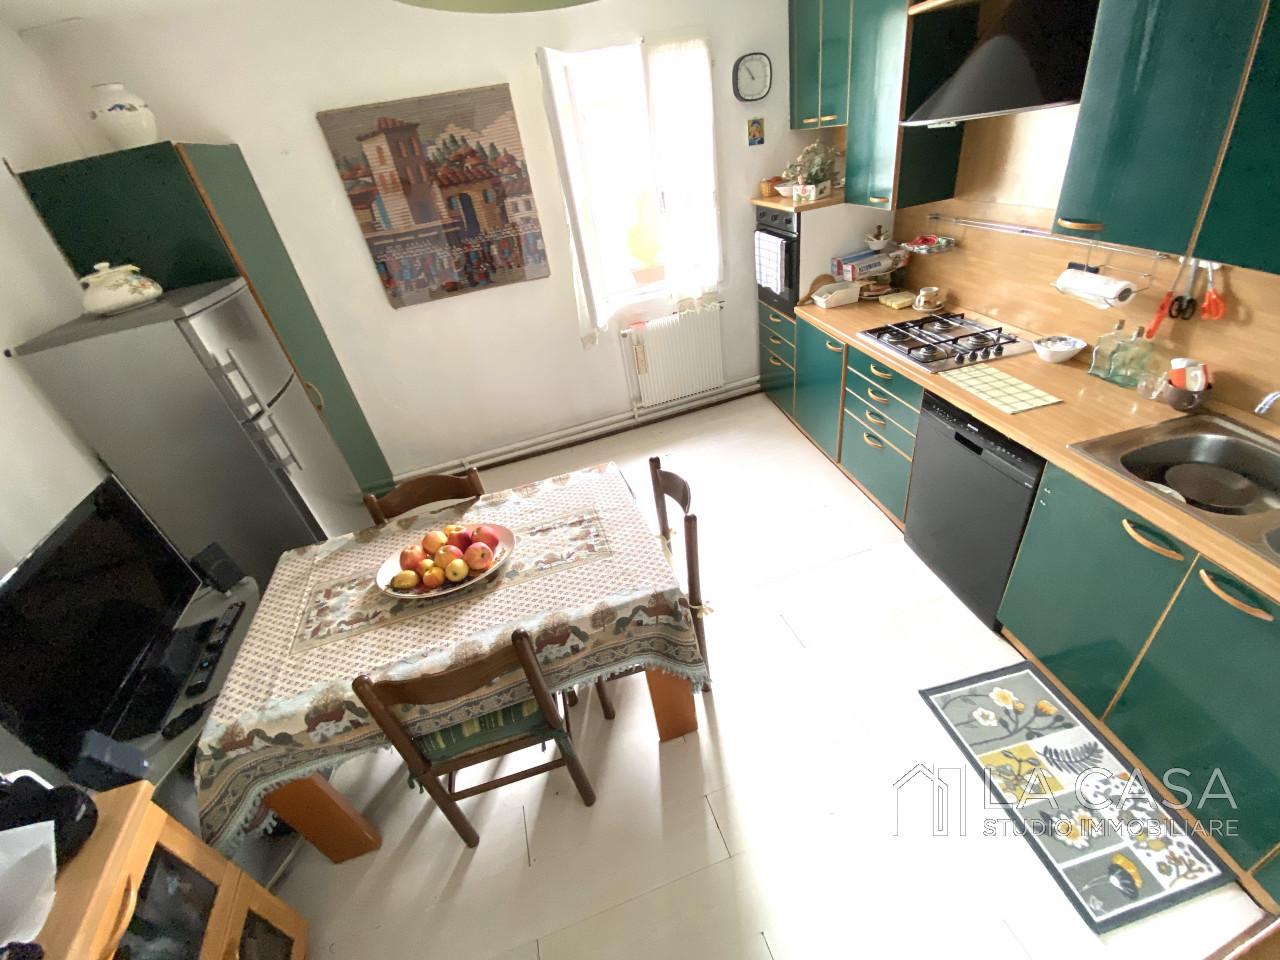 Palazzo plurifamiliare in vendita a Valvasone Arzene - Rif. P3 https://images.gestionaleimmobiliare.it/foto/annunci/200827/2284141/1280x1280/009__img_3718_wmk_0.jpg